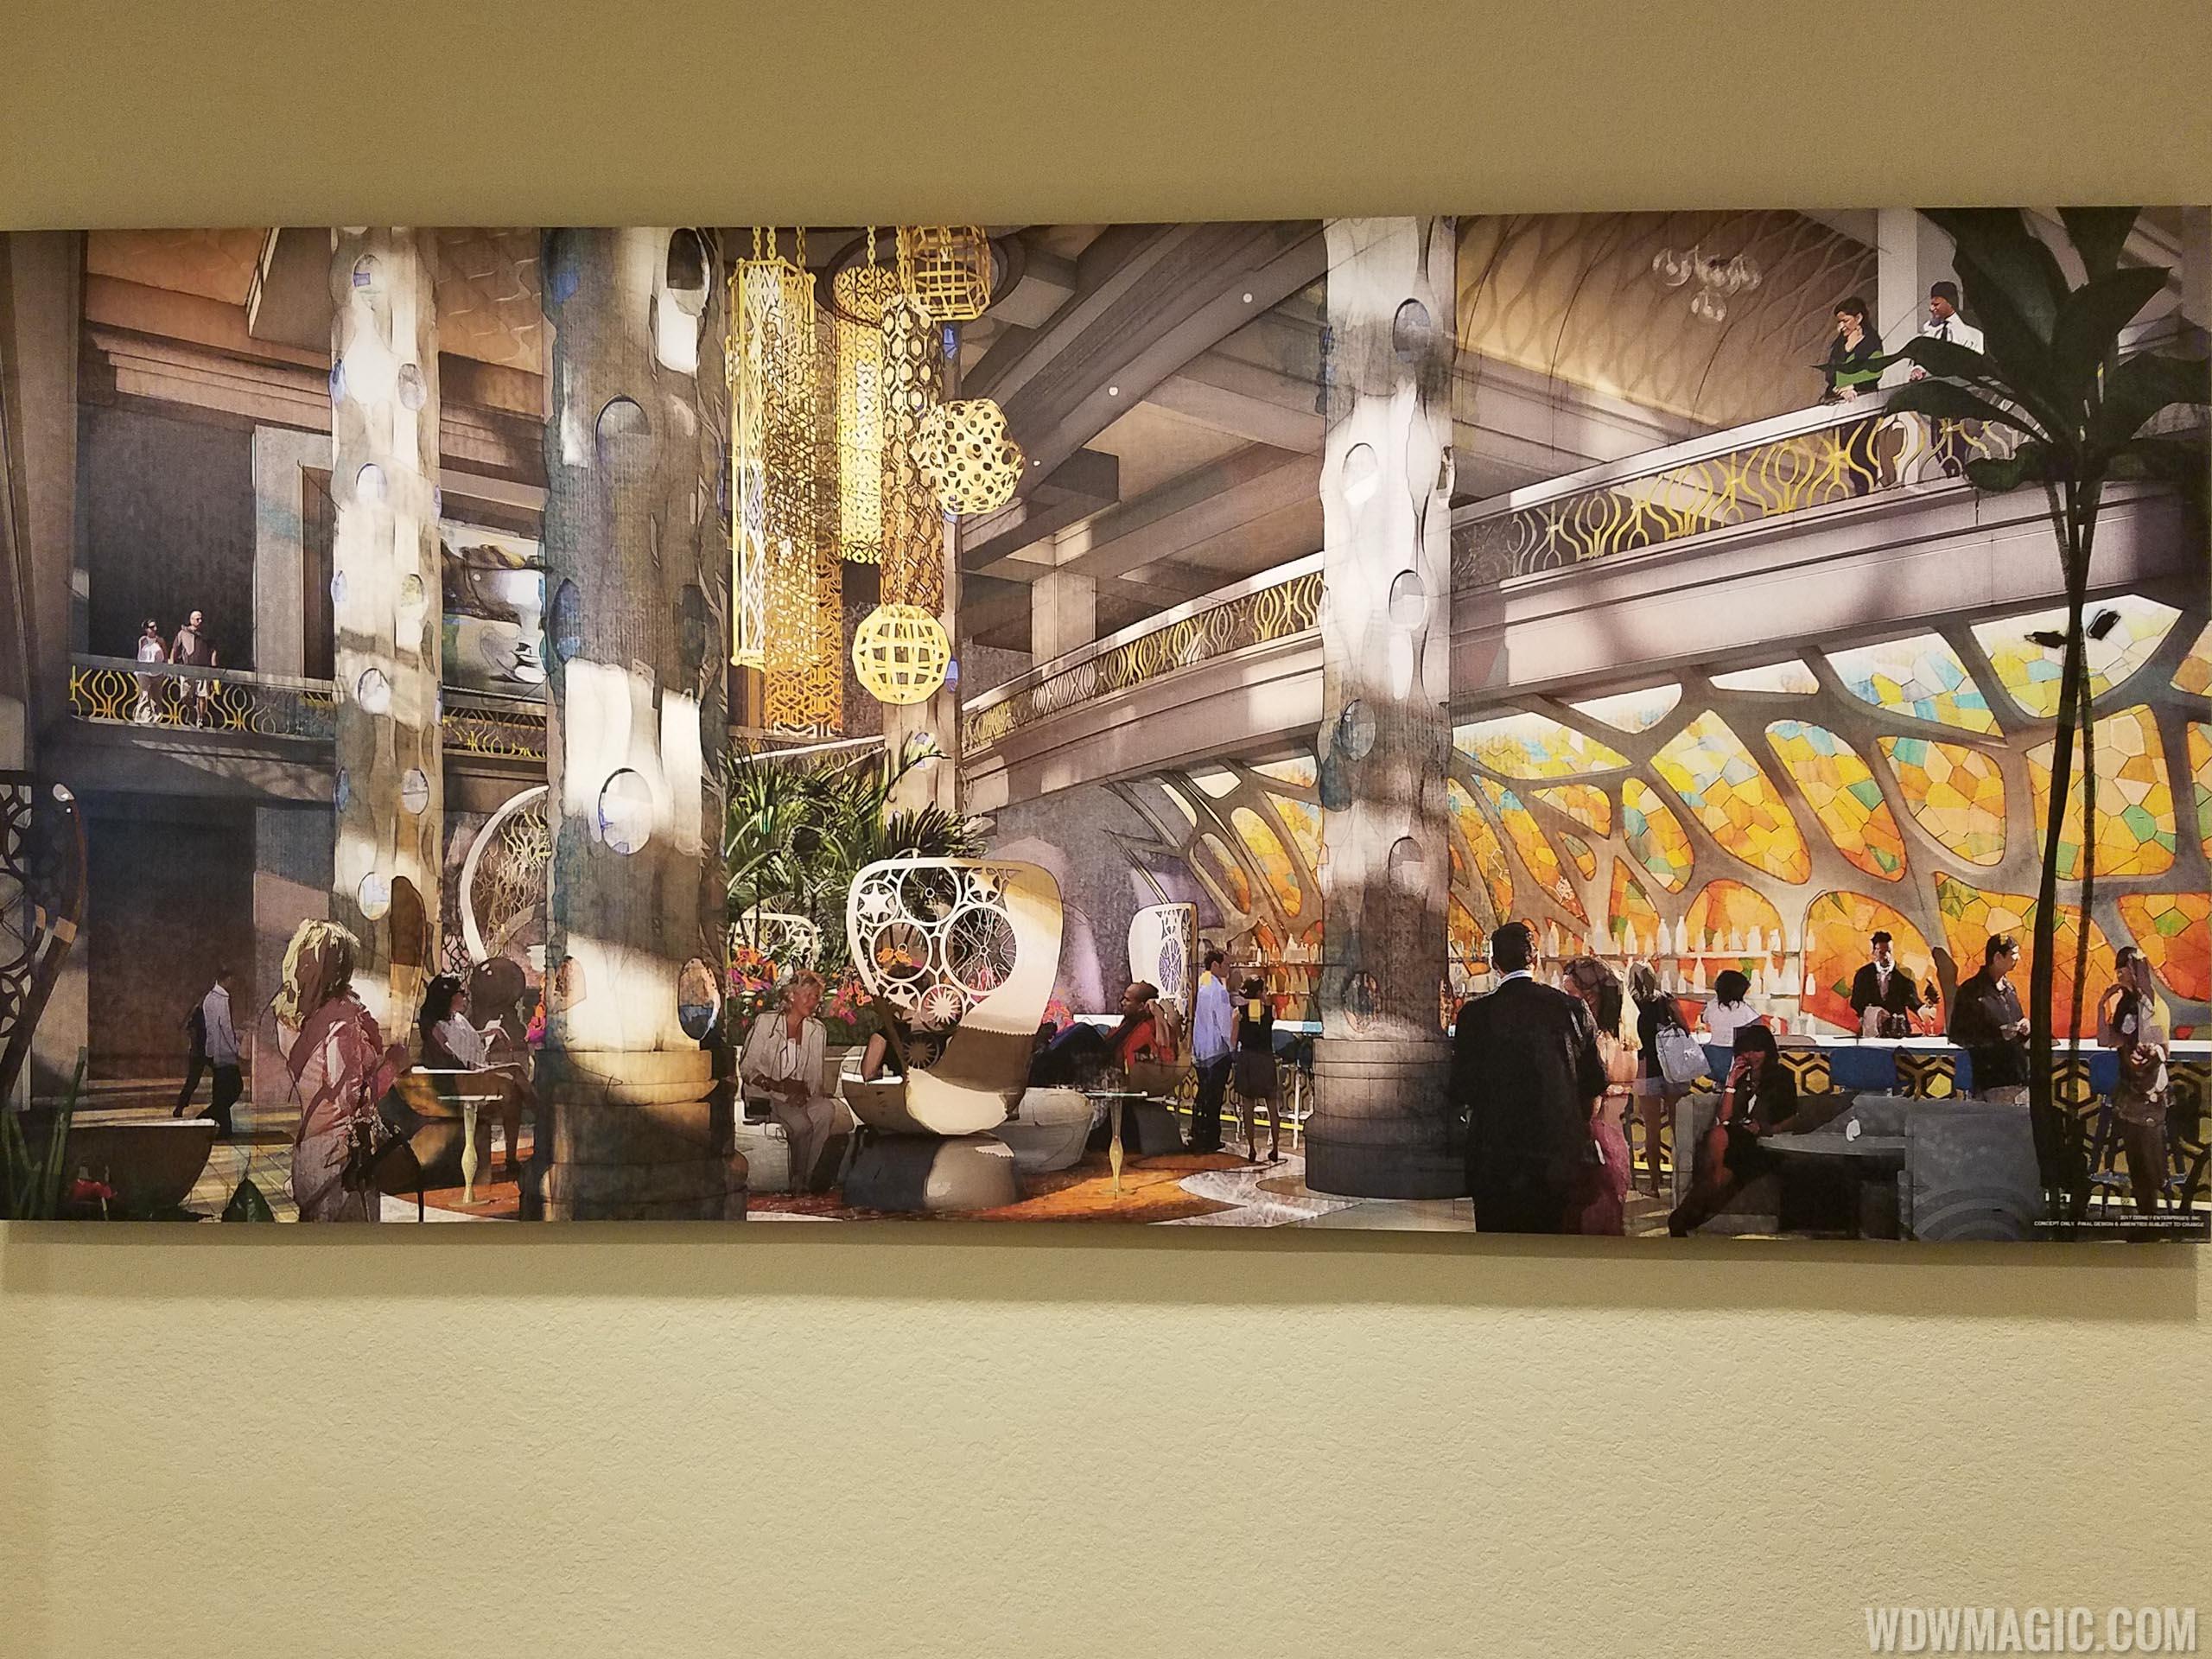 Coronado Springs Lounge